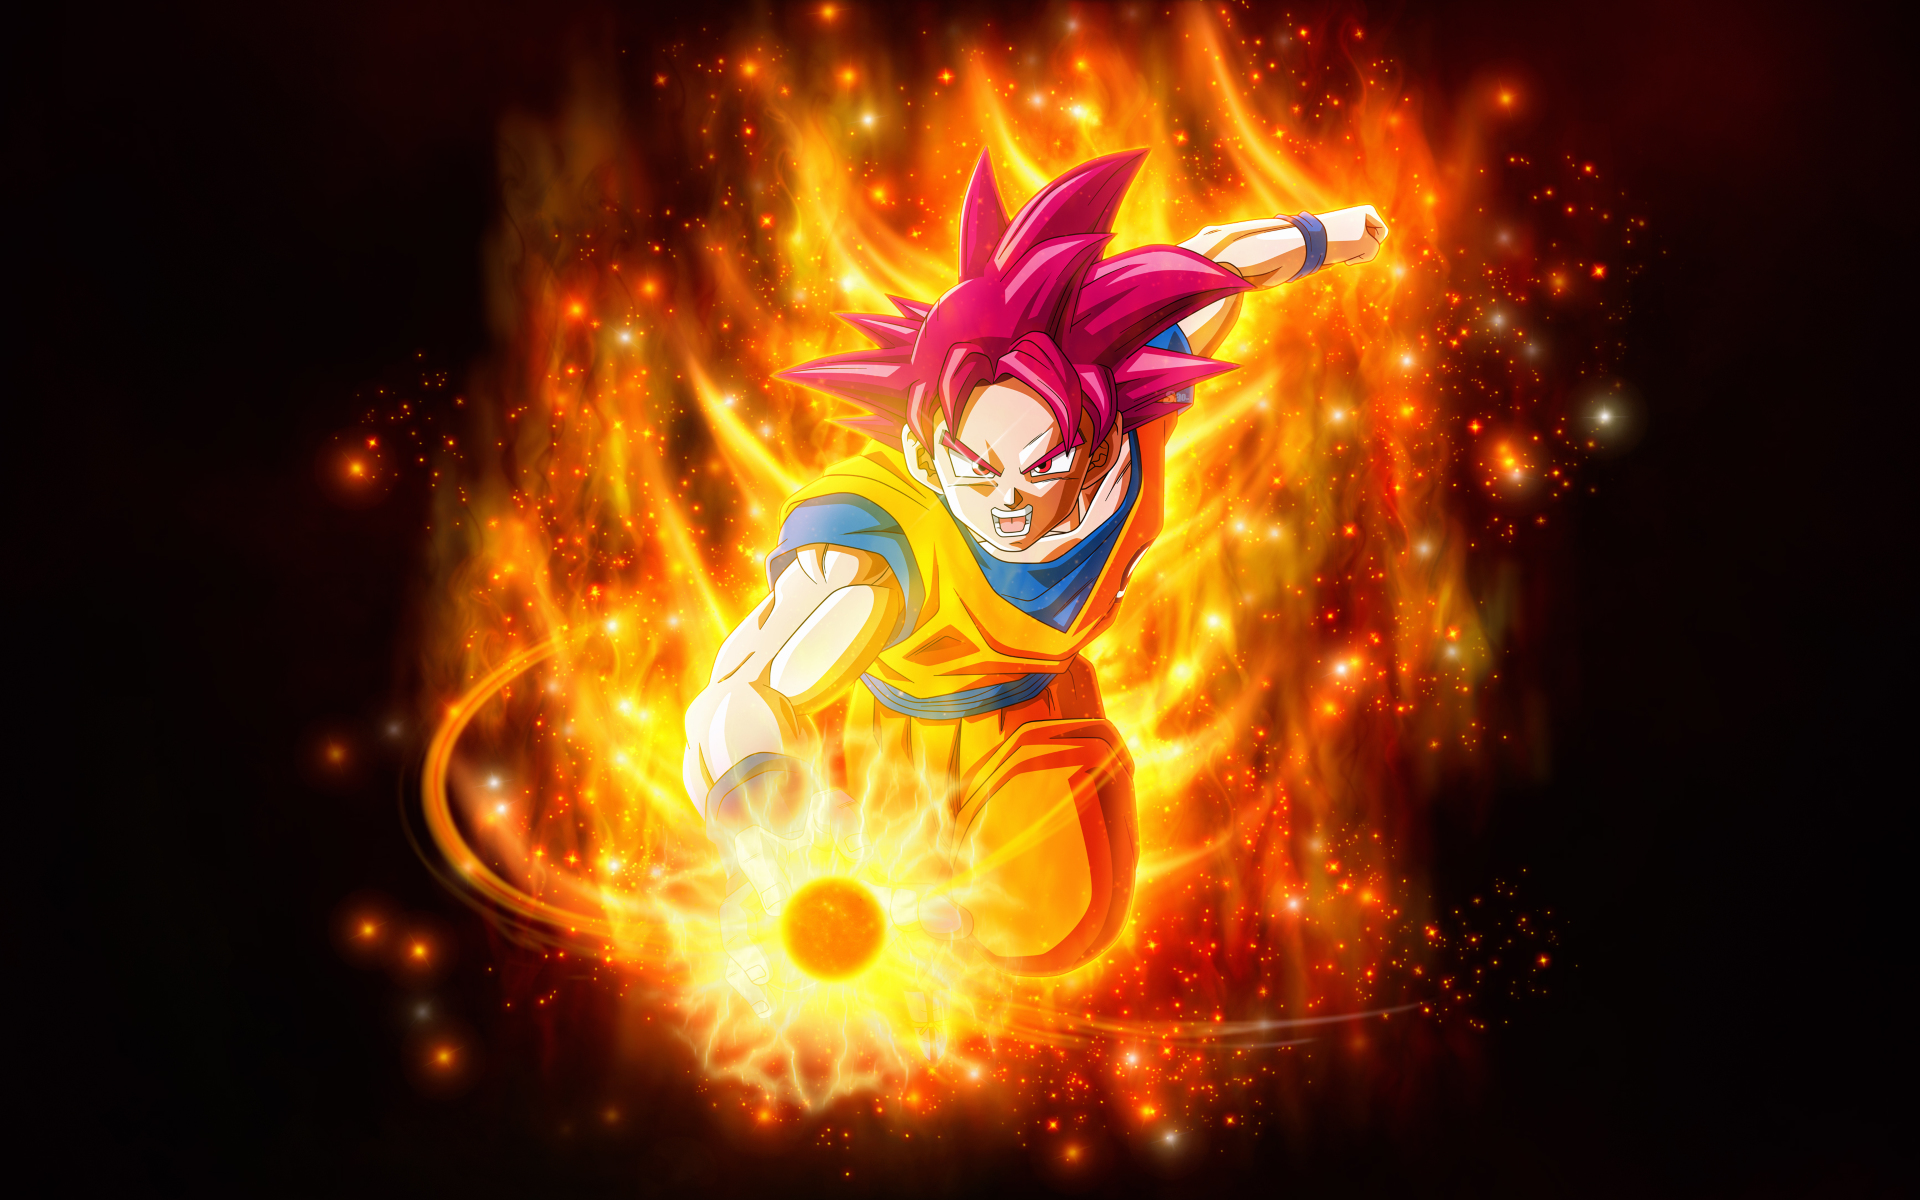 Super Saiyan God Goku Dragon Ball Hd 4k Wallpaper